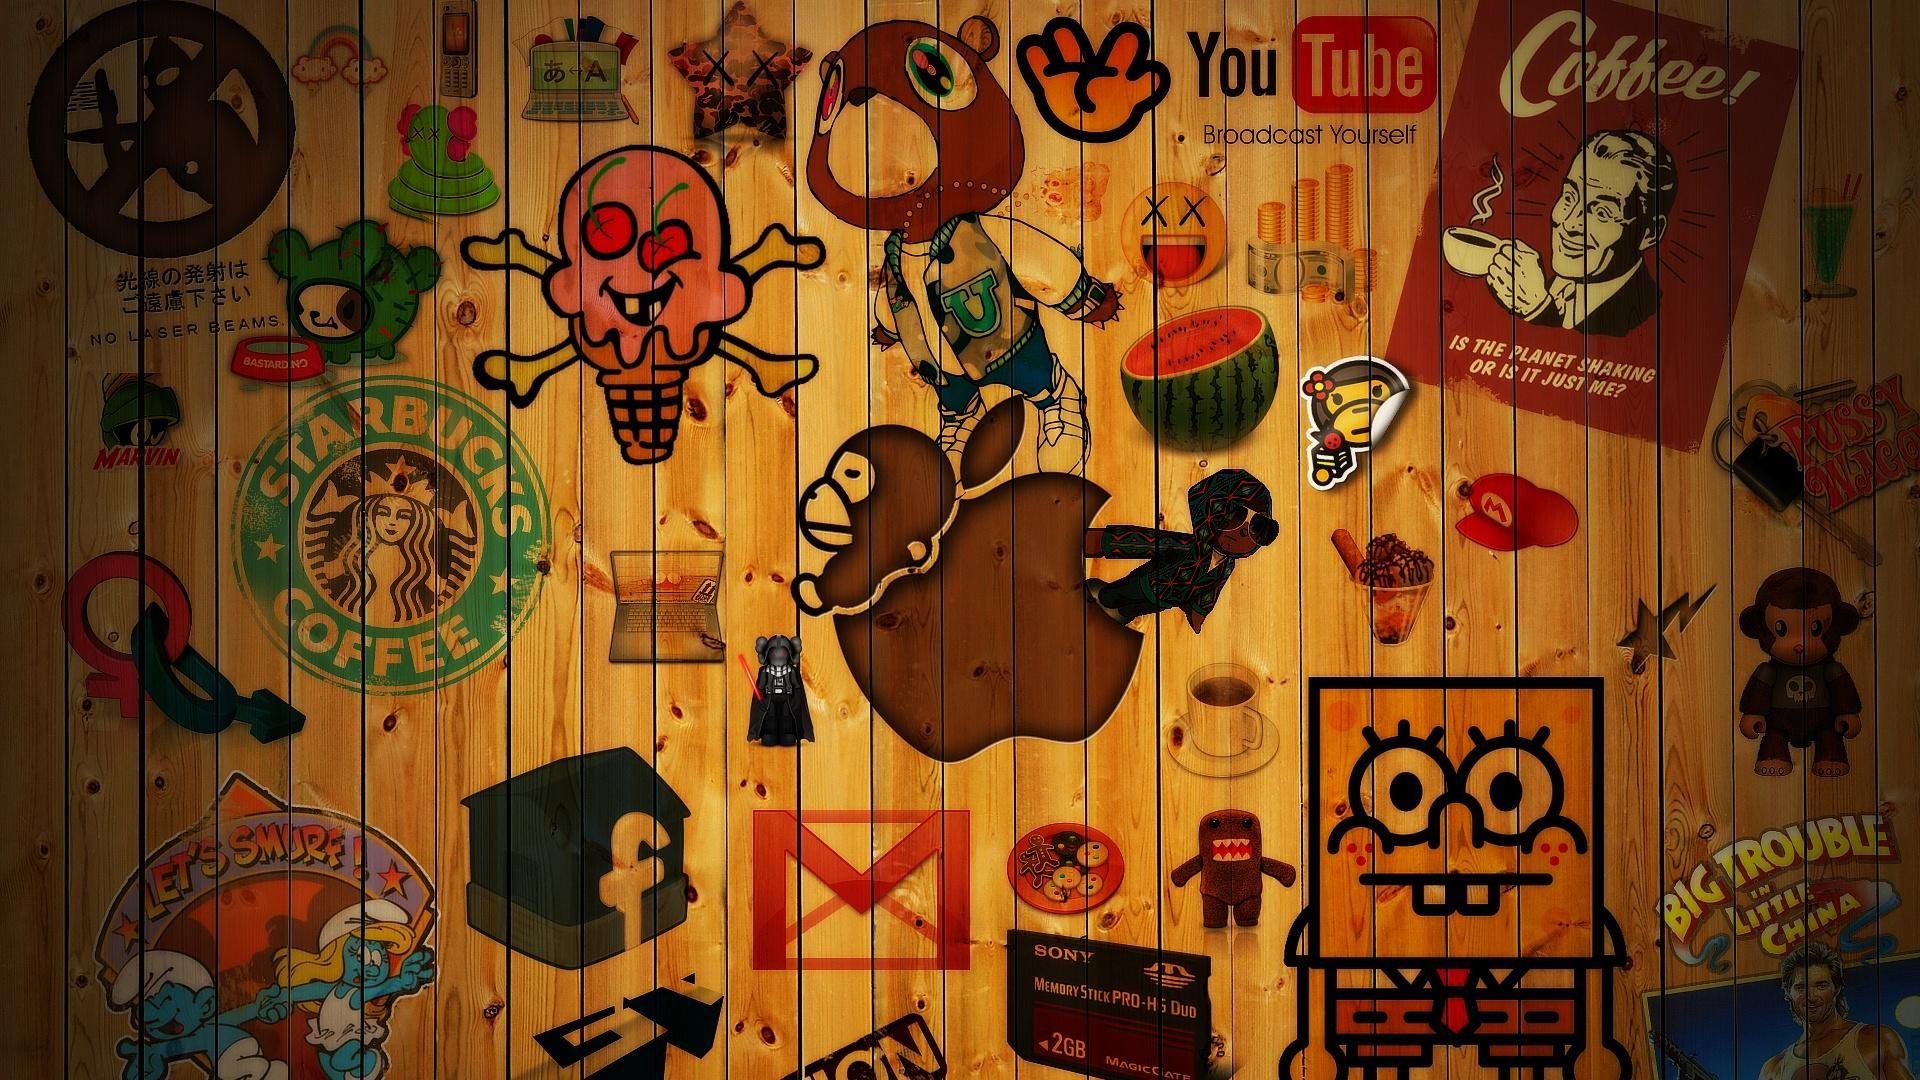 Cool Hd Wallpapers For Pc 107785 Apple Logo Wallpaper Bape Wallpapers Apple Wallpaper